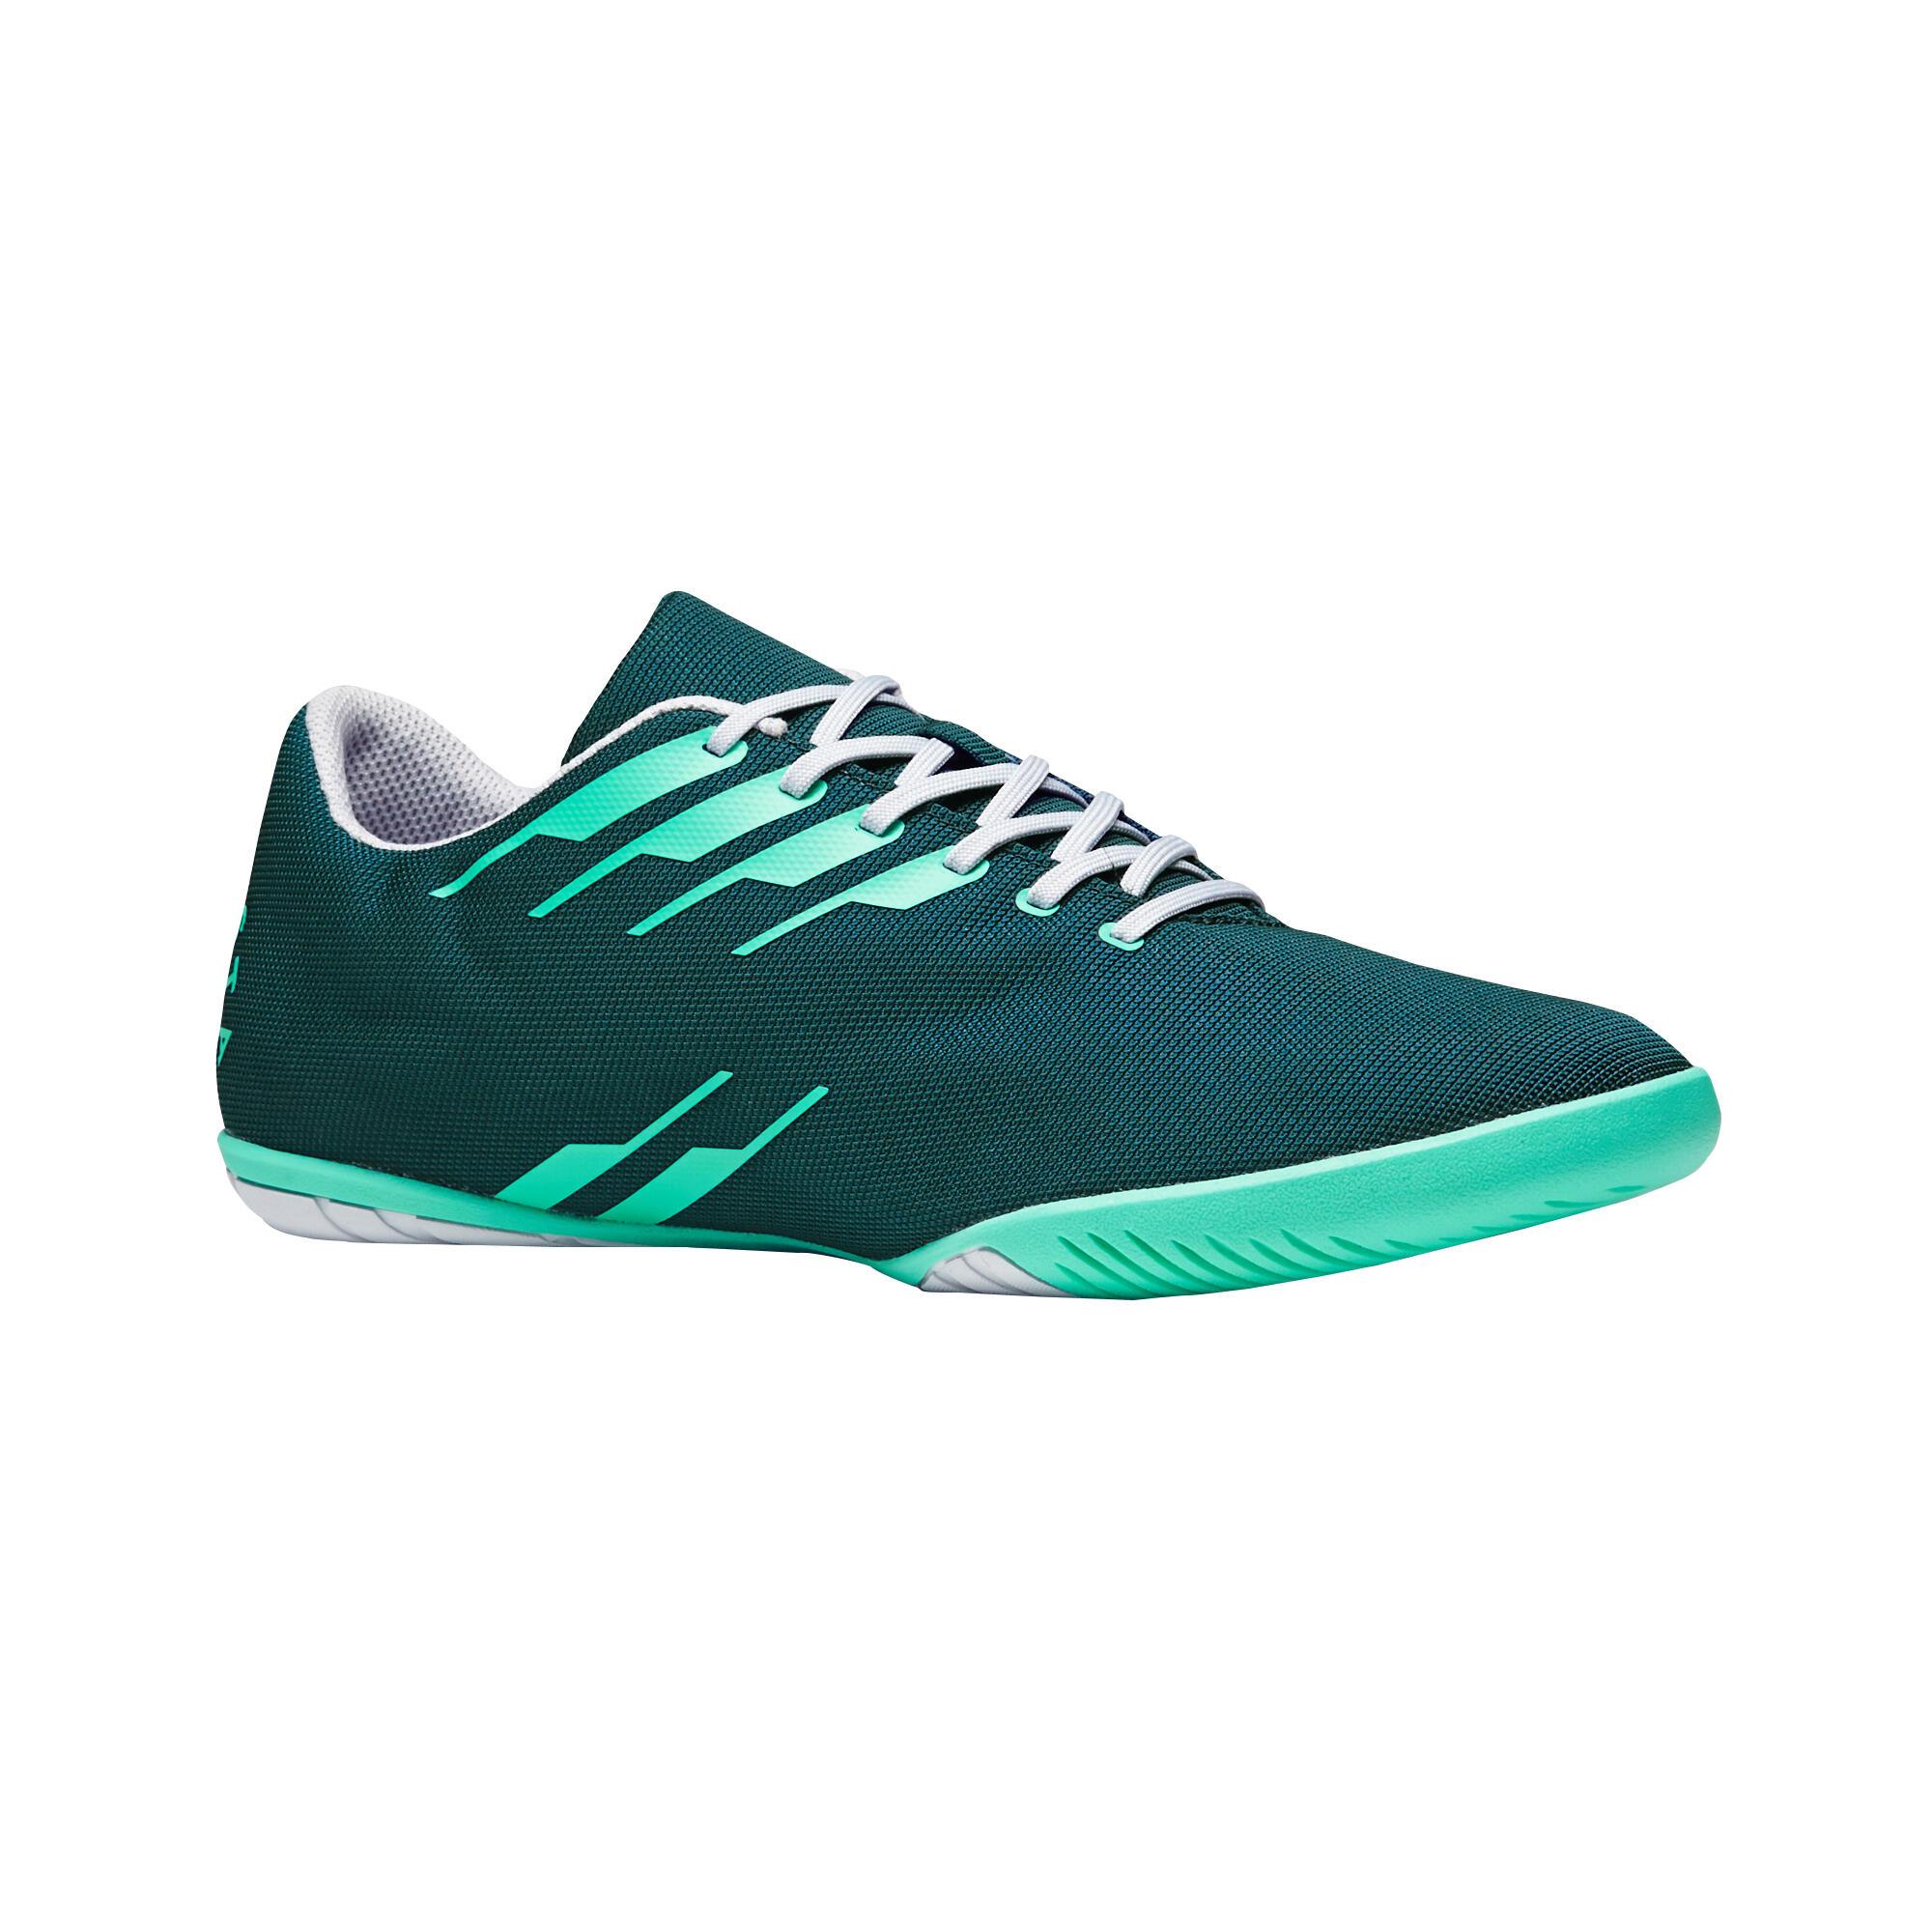 Hallenschuhe Futsal Fußball CLR 300 Erwachsene grün | Schuhe > Sportschuhe > Hallenschuhe | Imviso